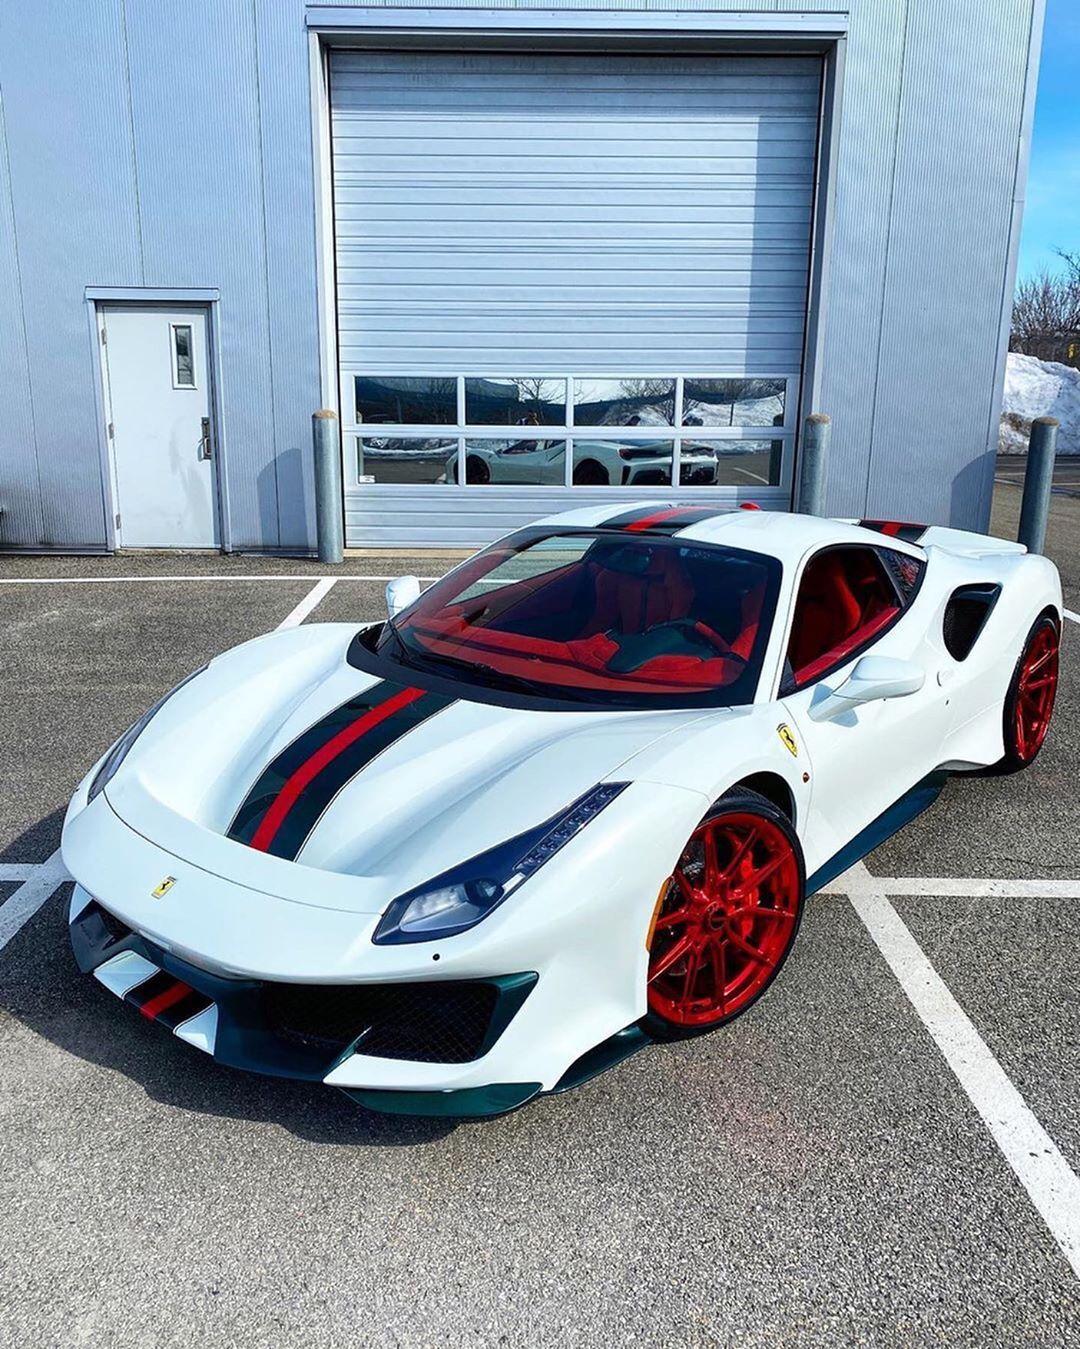 "Instagram | Limited Supercars on Instagram: ""Gucci Gang | Ferrari 488Pista Spec new wheels ↷ 🔝【Follow us for more】🔝⠀⠀ ⠀⠀ ⠀⠀⠀ ⠀⠀ ⠀⠀⠀⠀⠀⠀⠀ ⠀⠀ ⠀⠀⠀⠀ ⠀⠀⠀⠀⠀⠀ (📸|🎥) : @ferrariquebec ⠀⠀⠀ ⠀⠀⠀⠀…"""